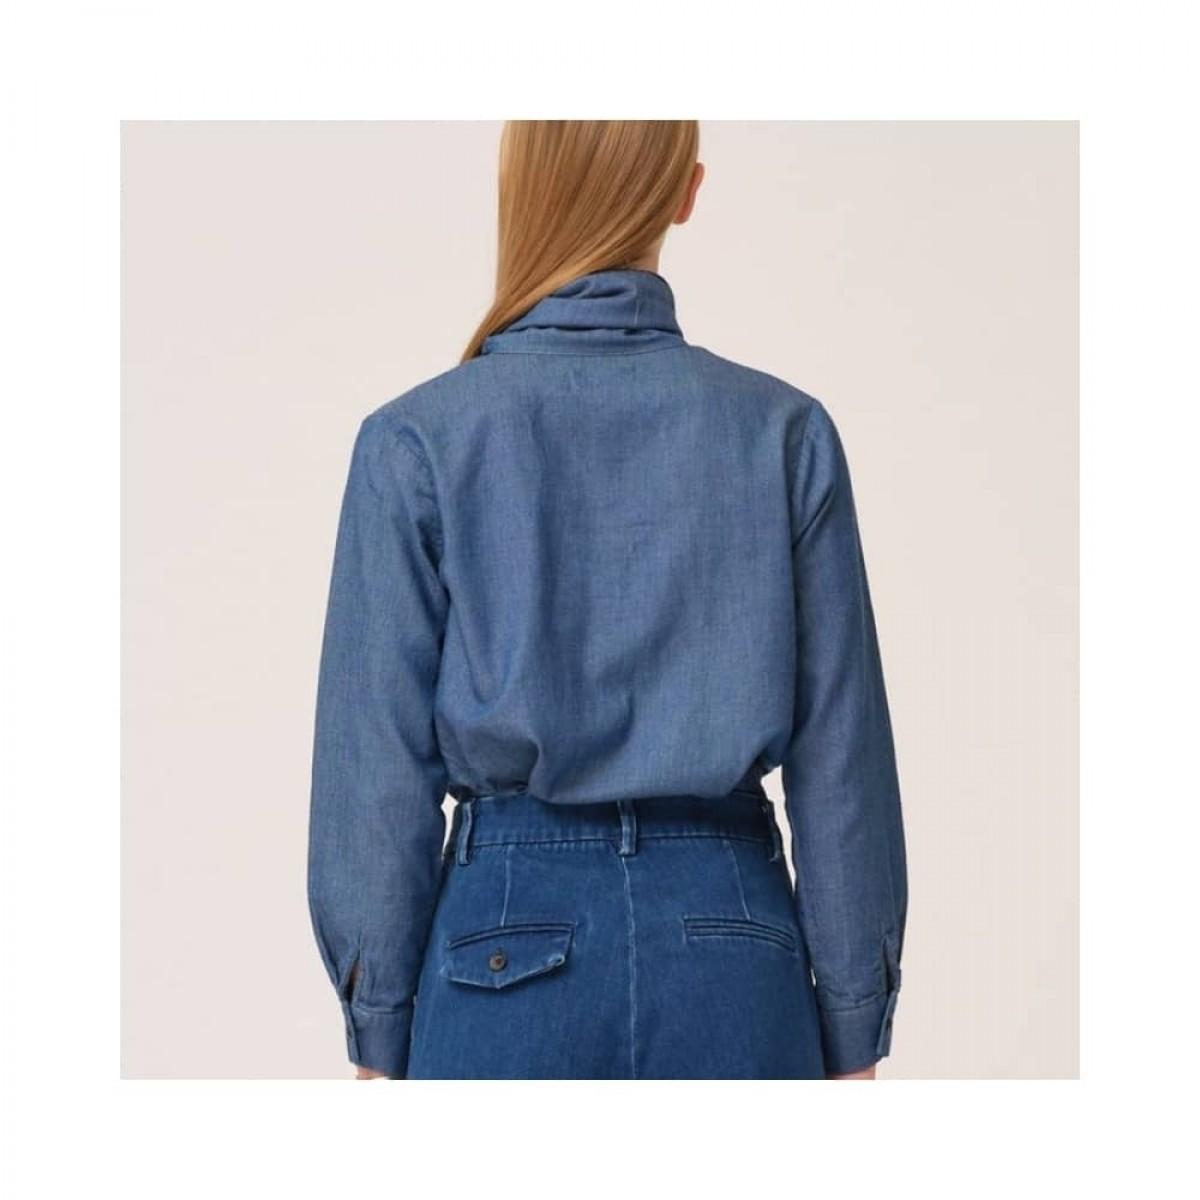 marston bow shirt - denim blue - model ryggen